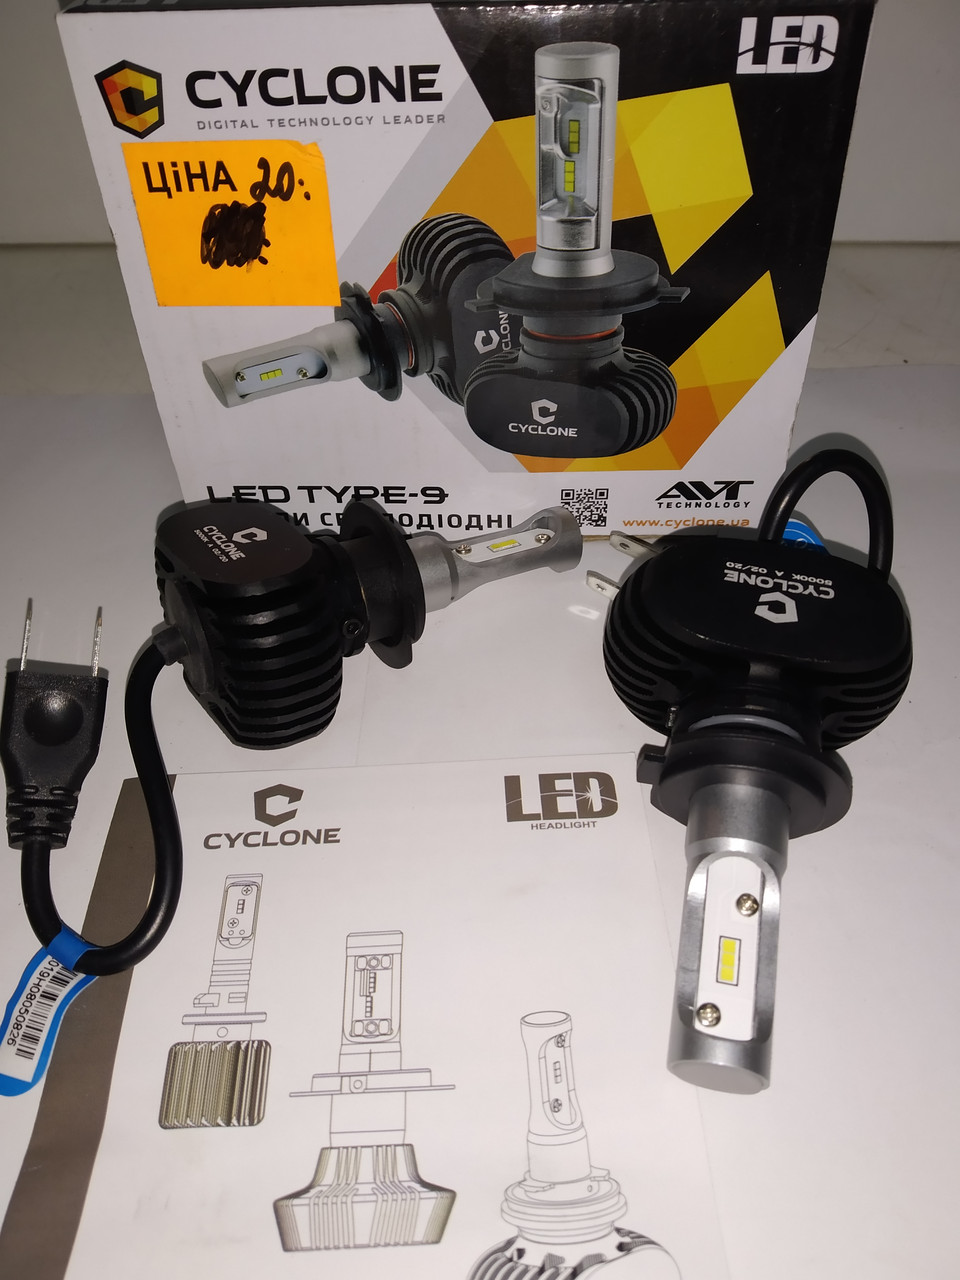 Светодиодные лампы Cyclone LED H7 5000K 4000Lm type 9A